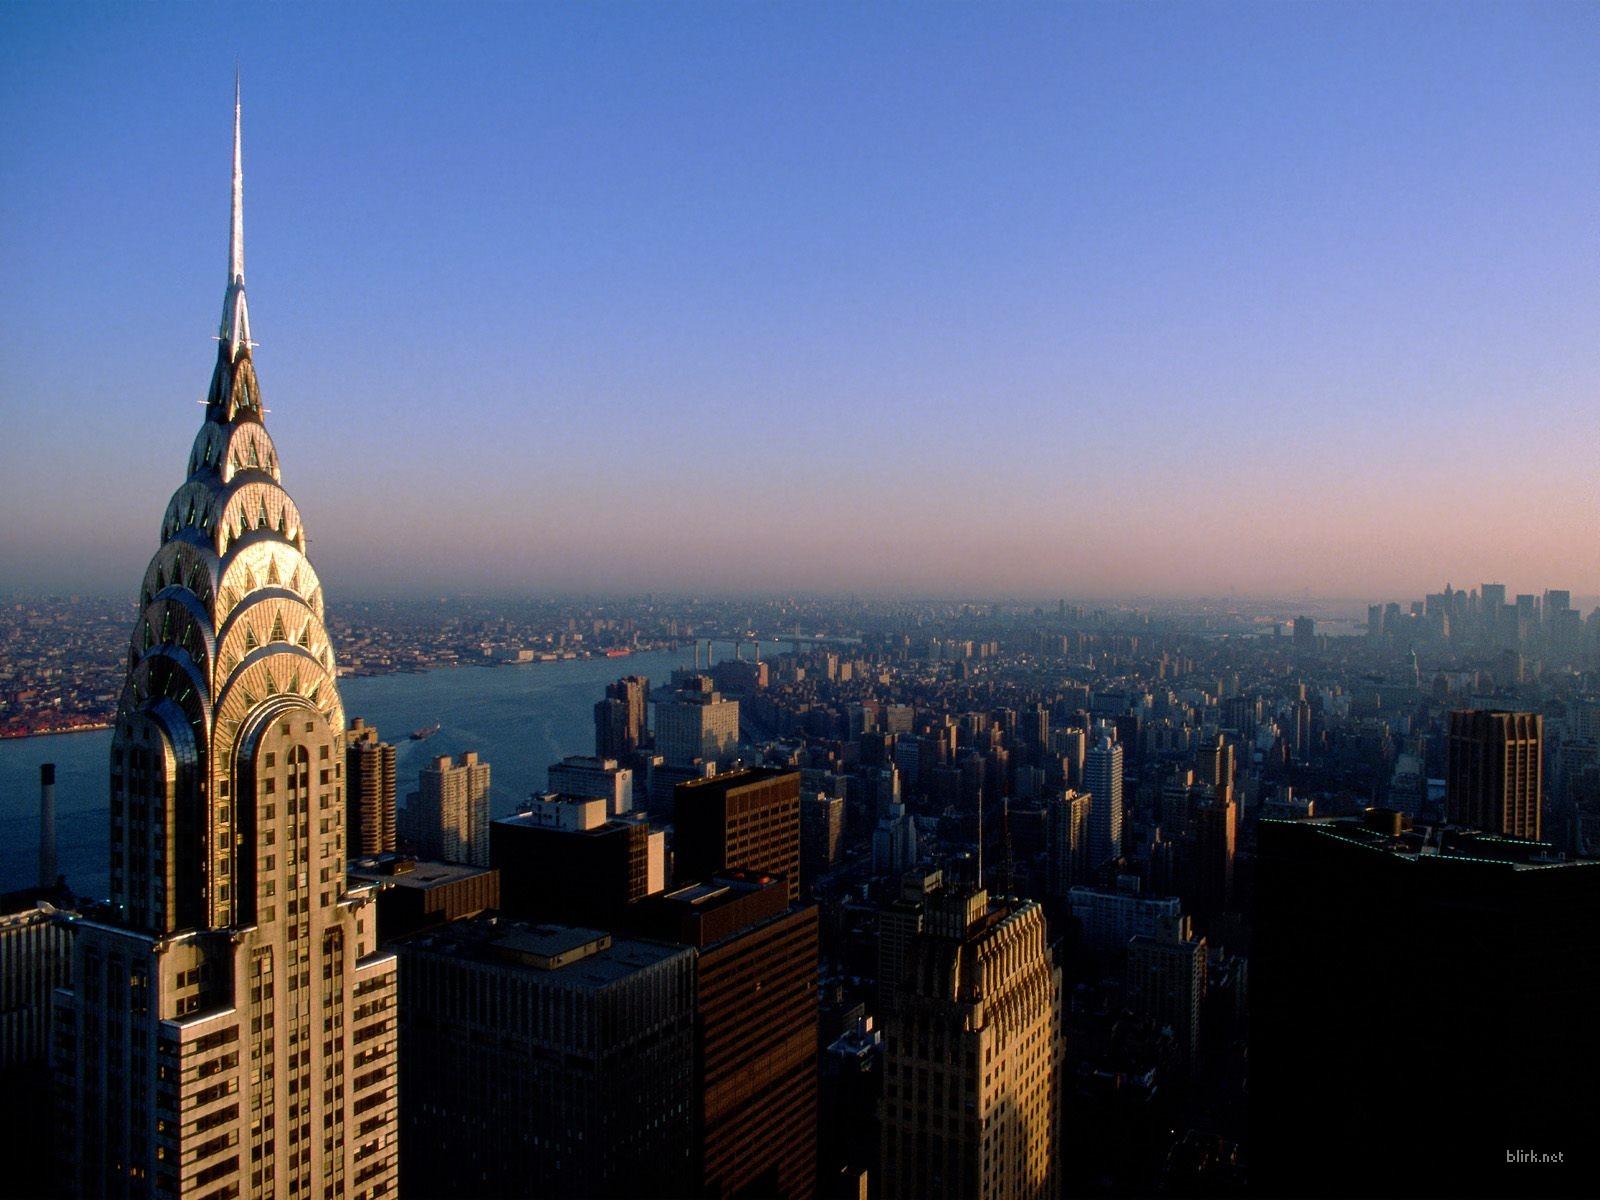 http://4.bp.blogspot.com/-5C6HmeX5QoM/ThNshEqU1MI/AAAAAAAAAA8/RyAWfVnXMJs/s1600/empire-state-building1.jpg